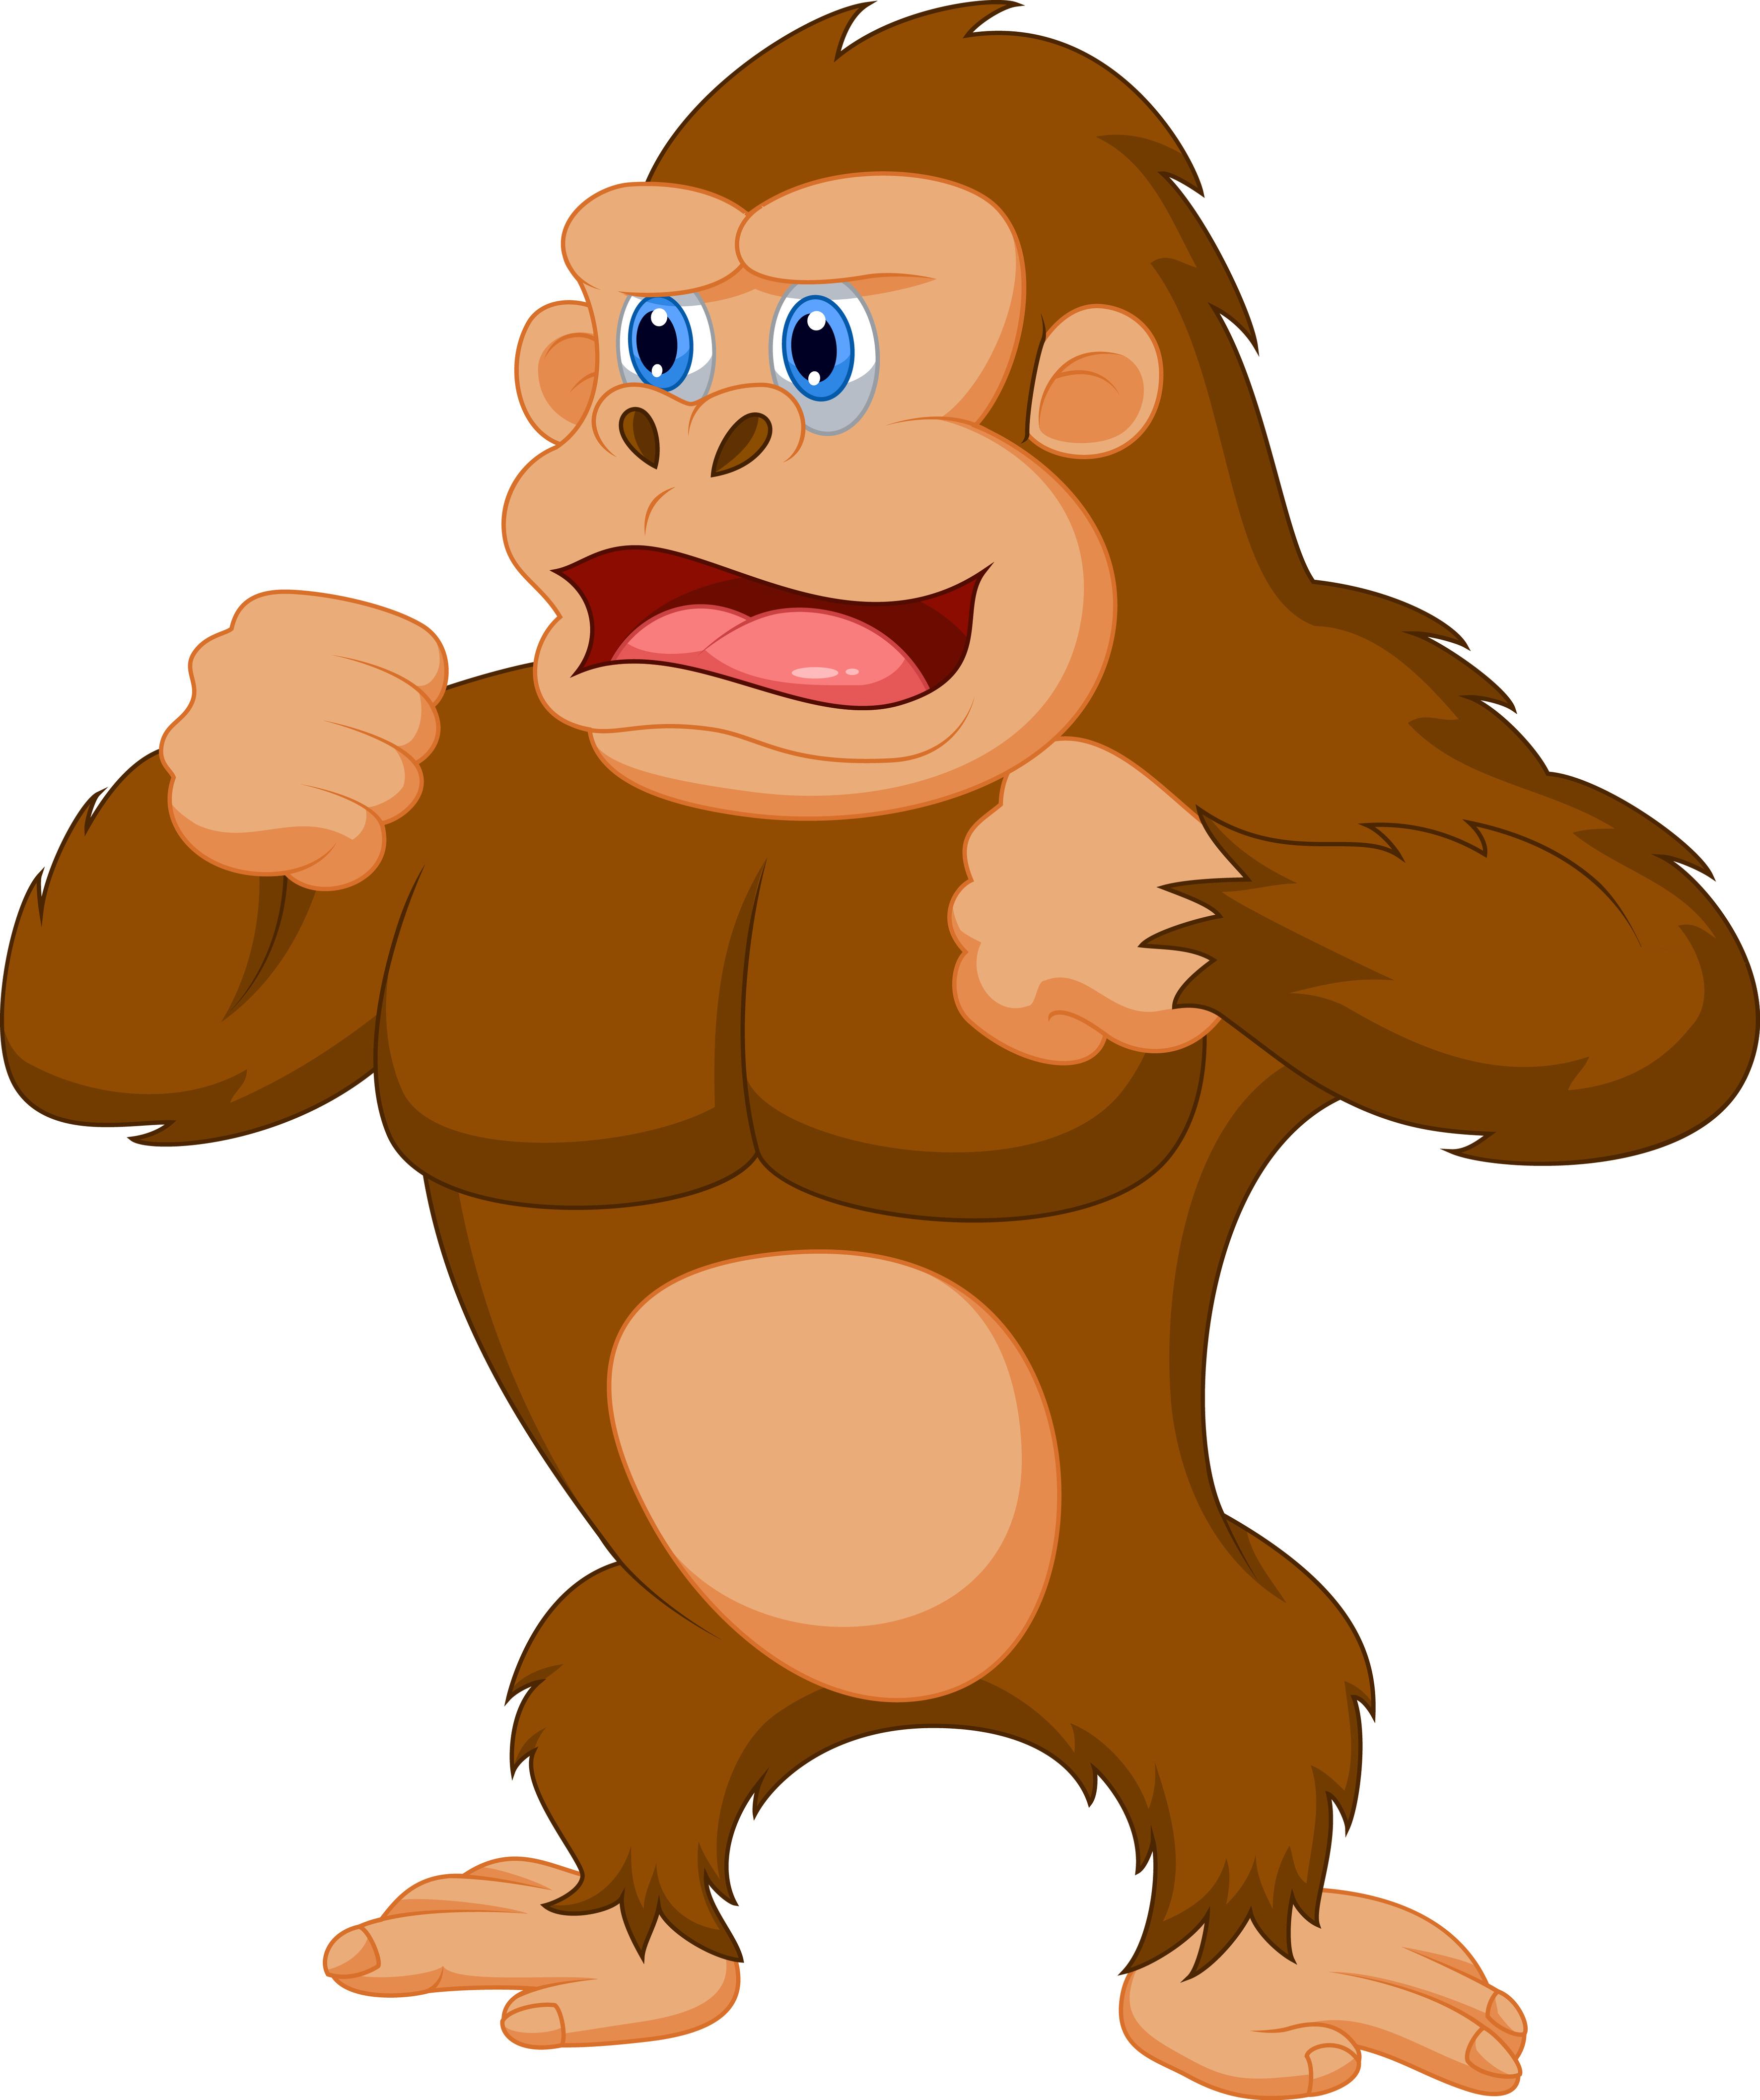 Ape cartoon clipart image royalty free download Cartoon Gorilla Clipart | Free download best Cartoon Gorilla Clipart ... image royalty free download